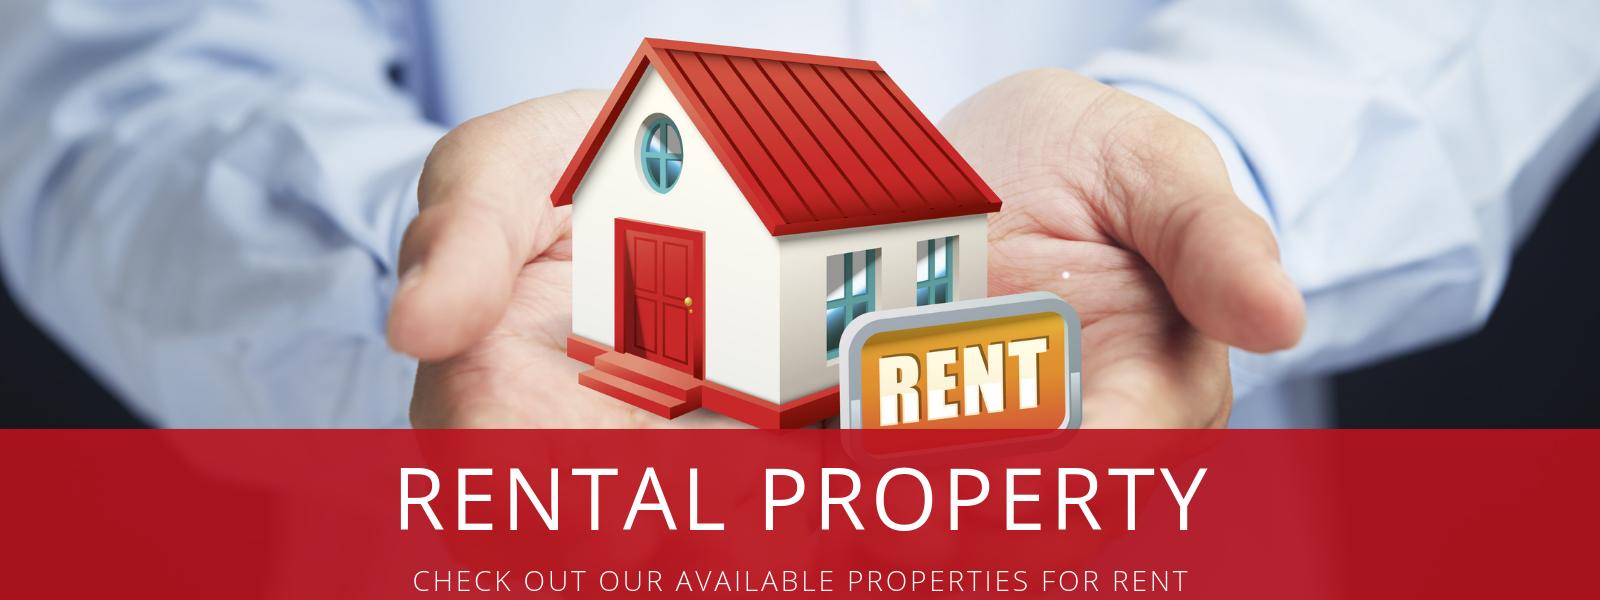 Desantis Property Management Desantispropertymanagement Profile Pinterest